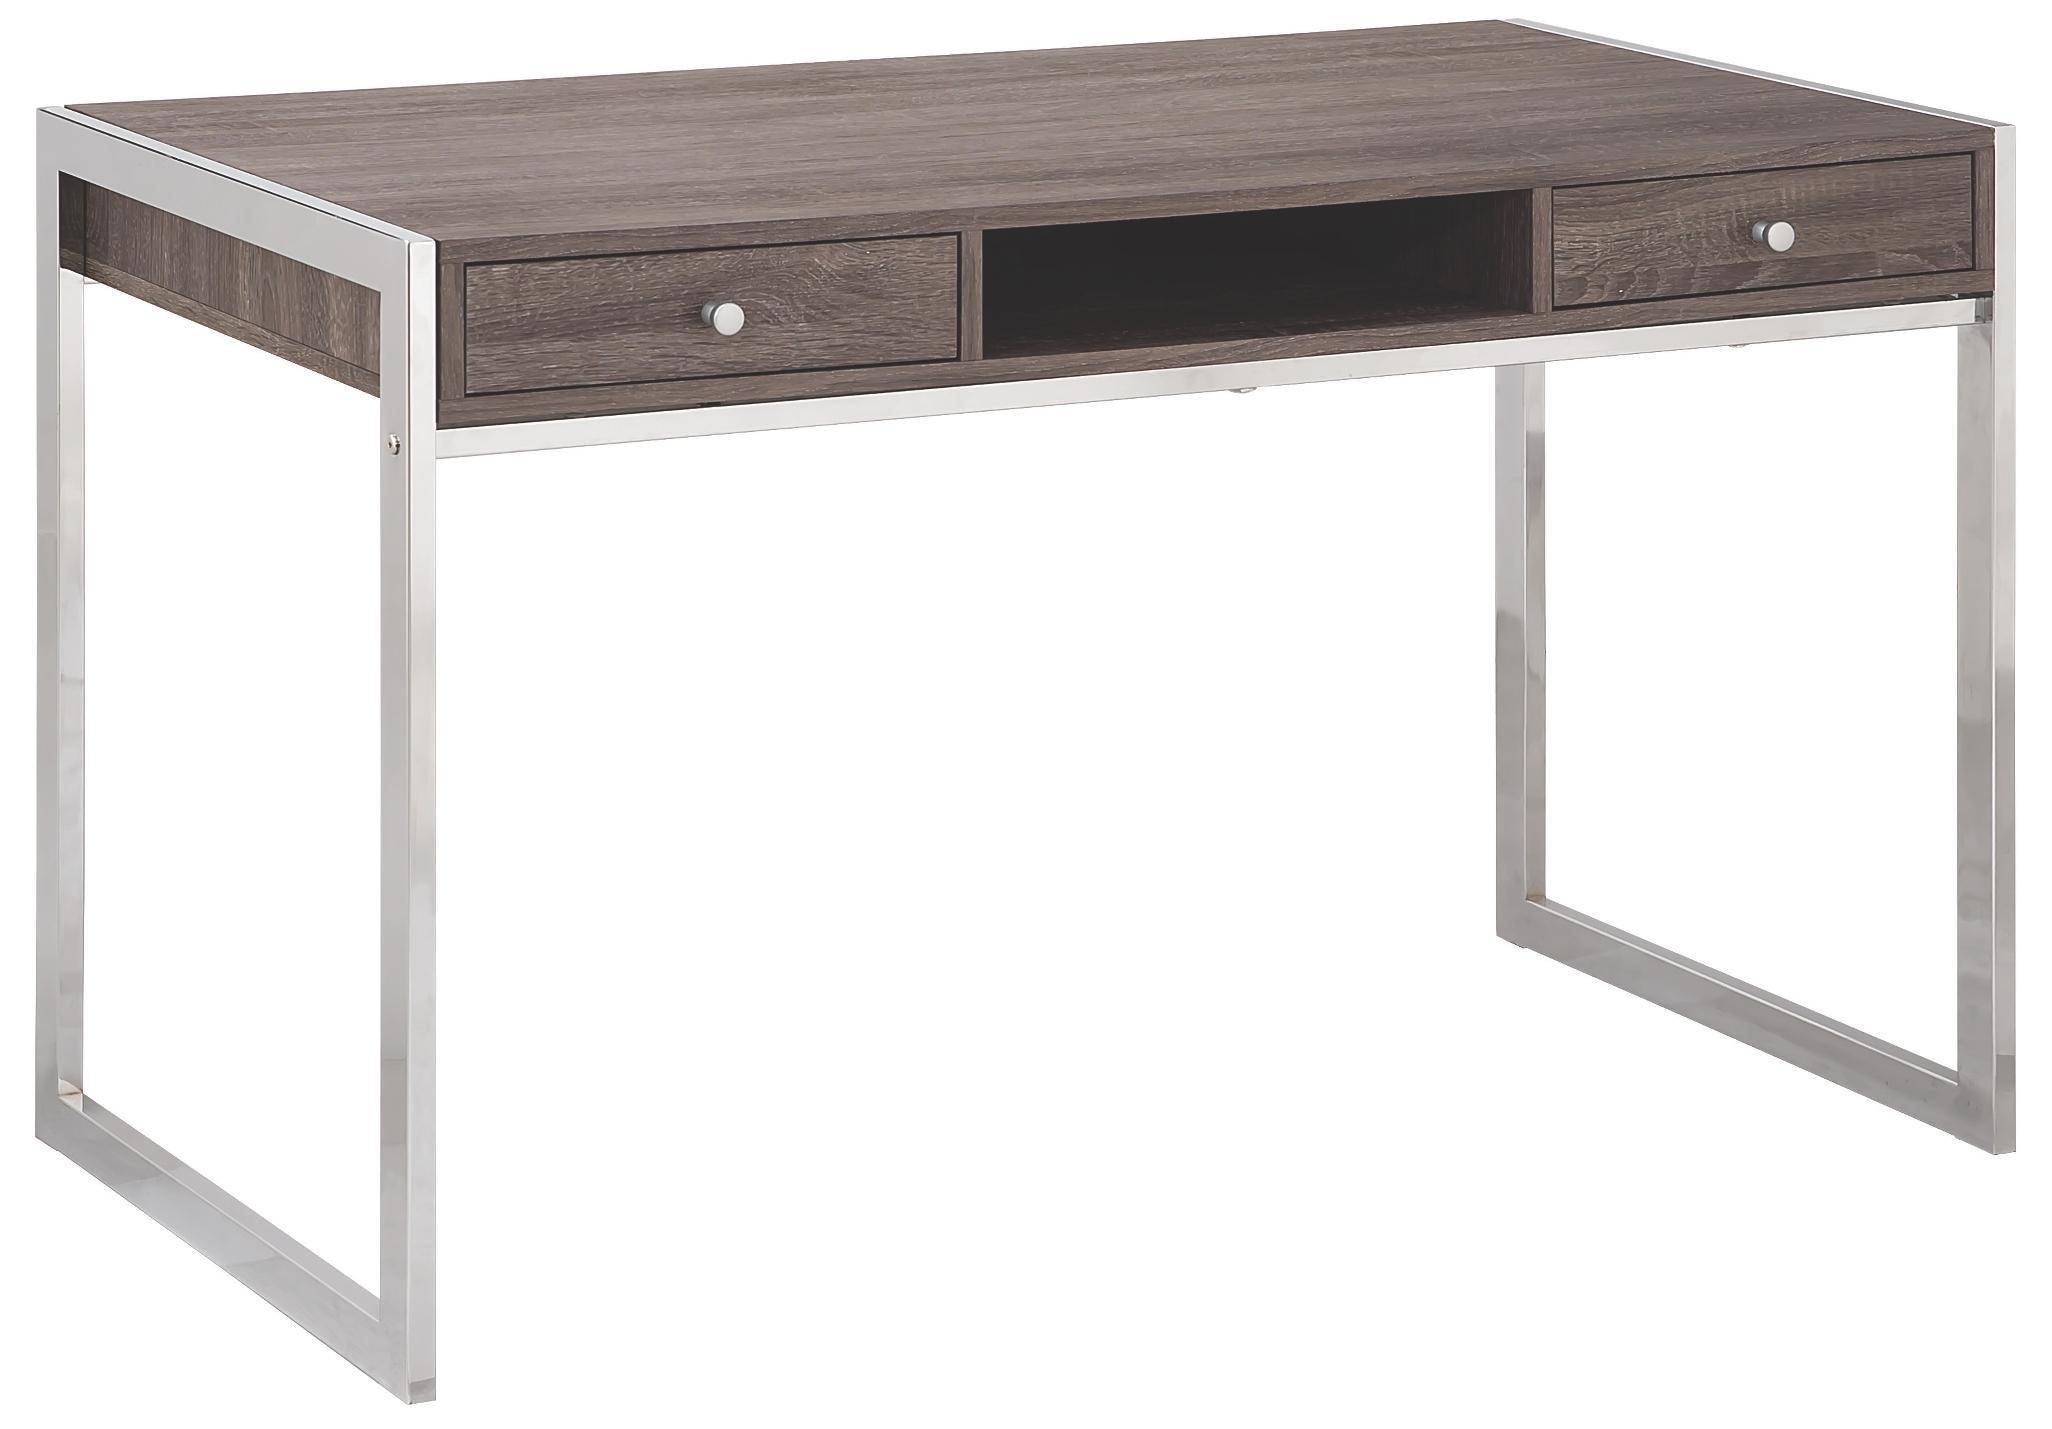 Coaster 801221 Home Furnishings Desk, Weathered Grey/Chrome